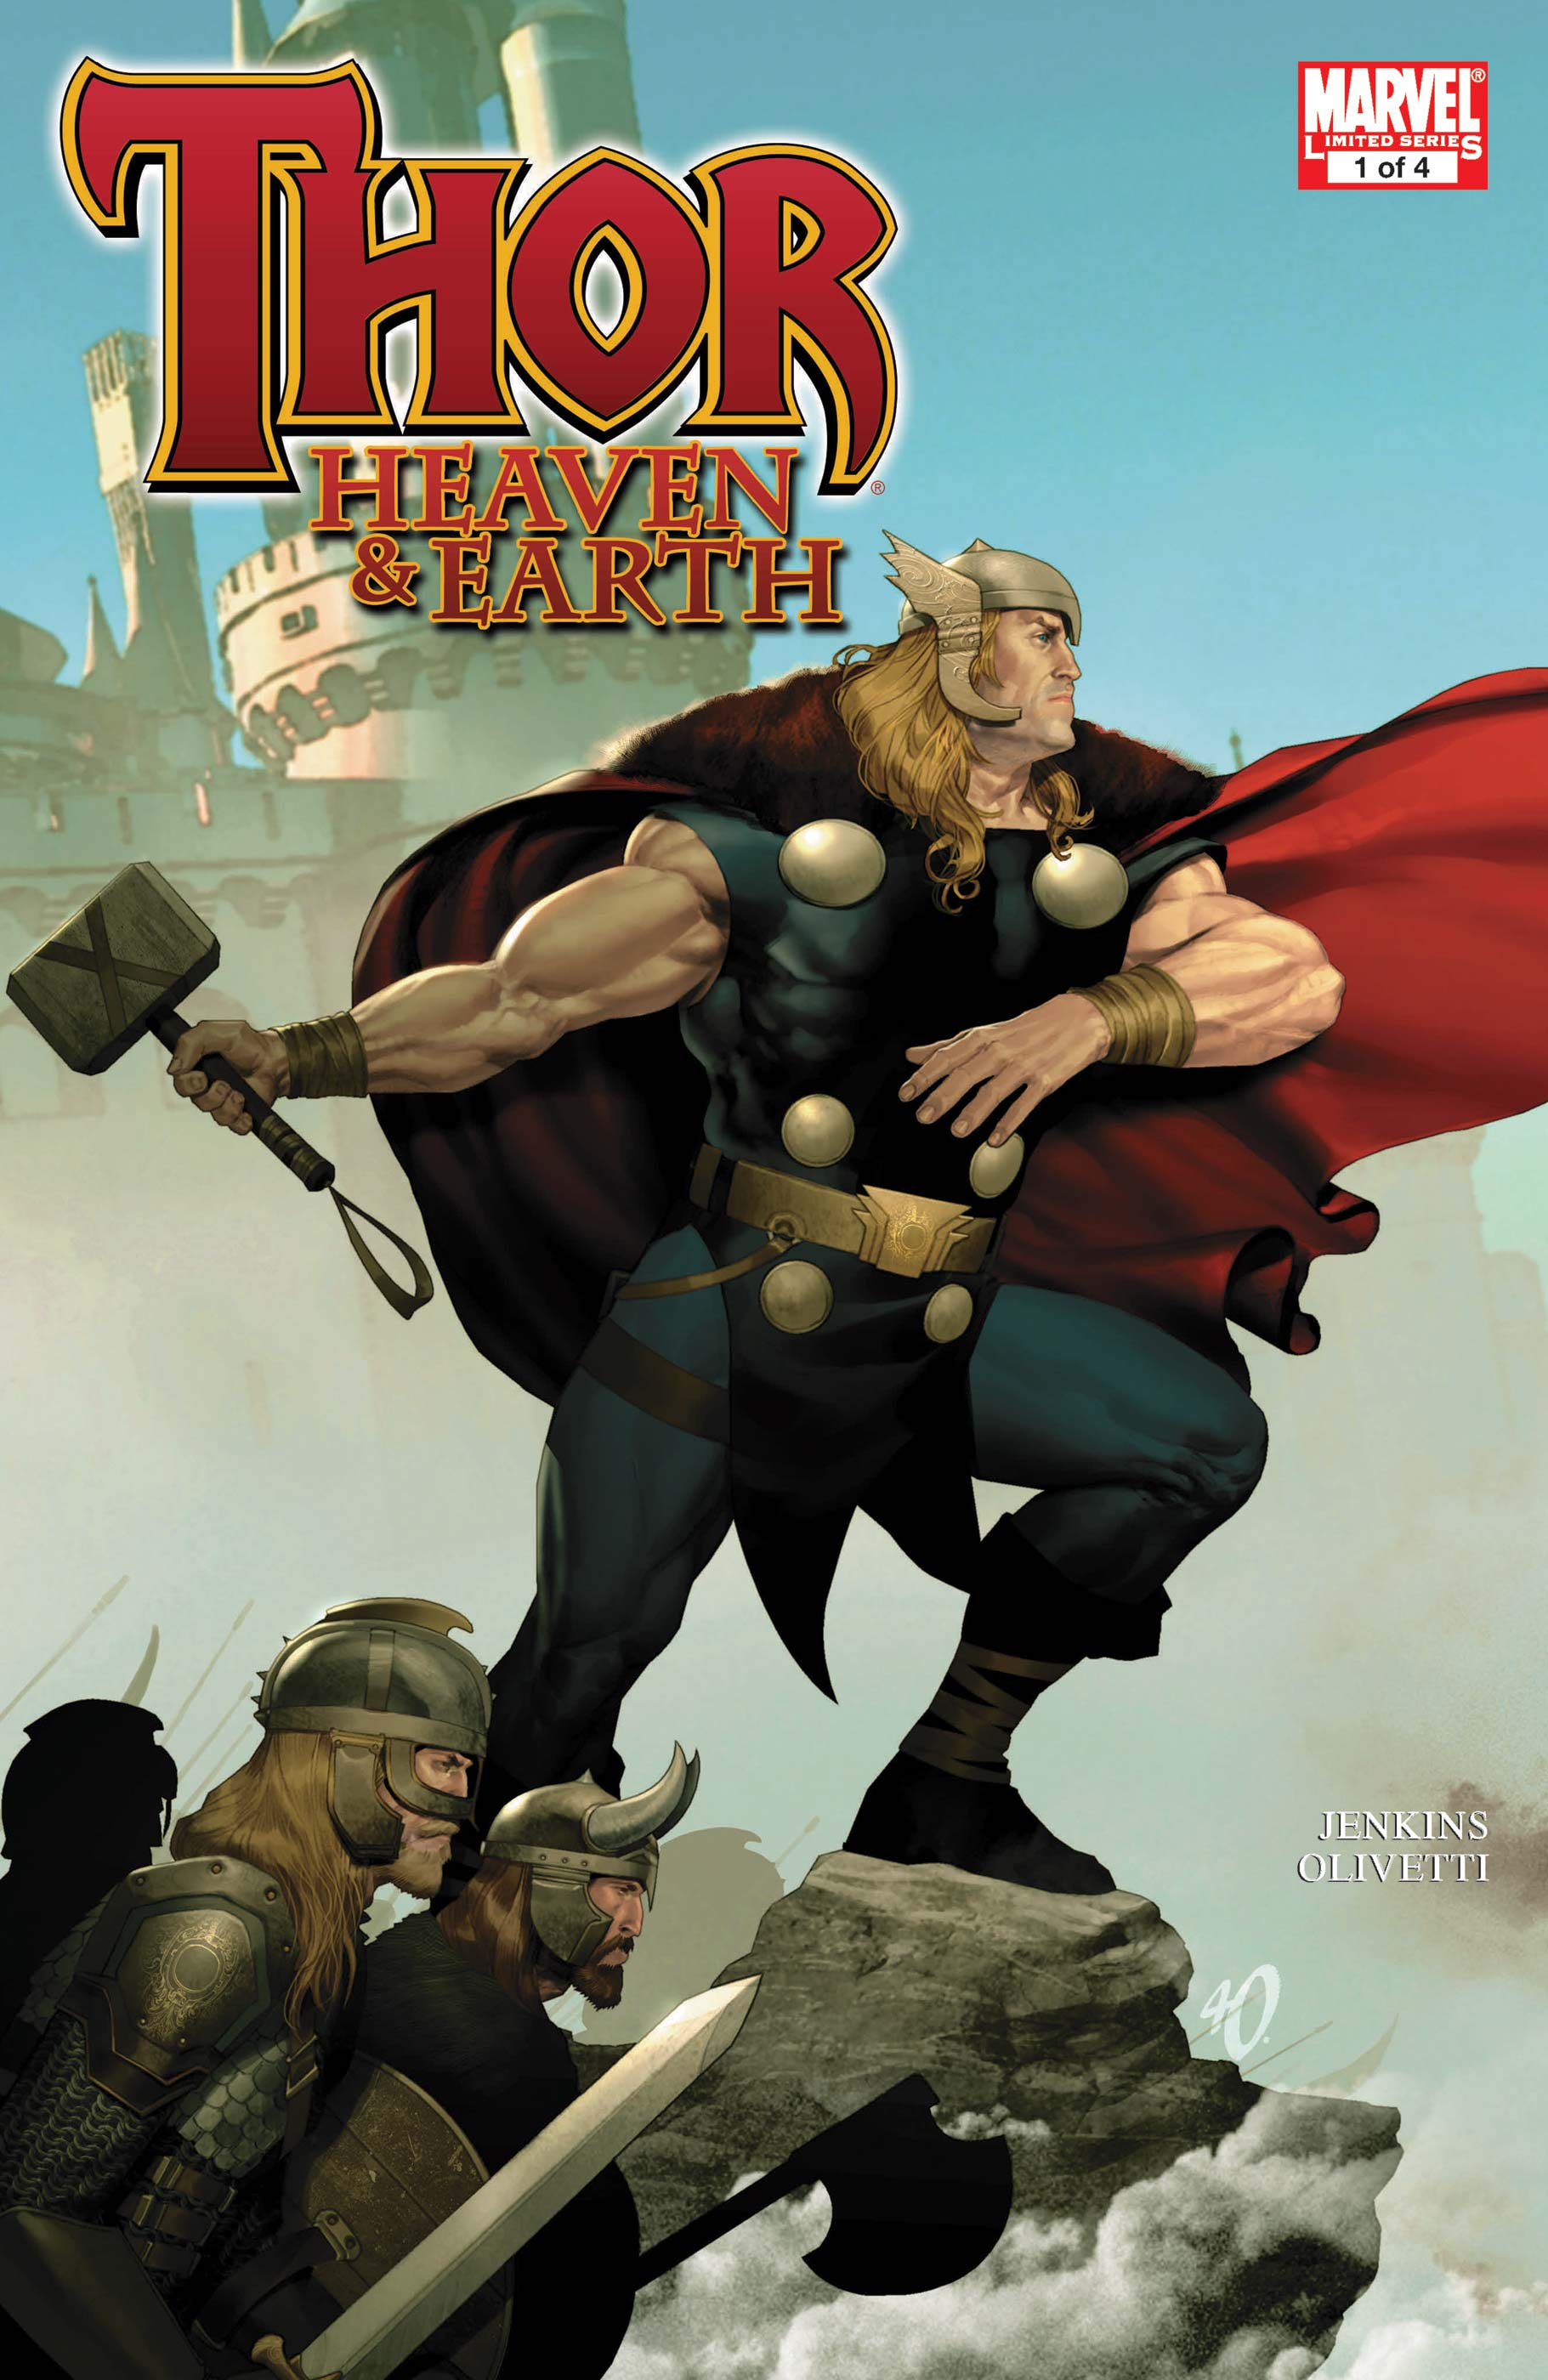 Thor: Heaven & Earth (2011) #1